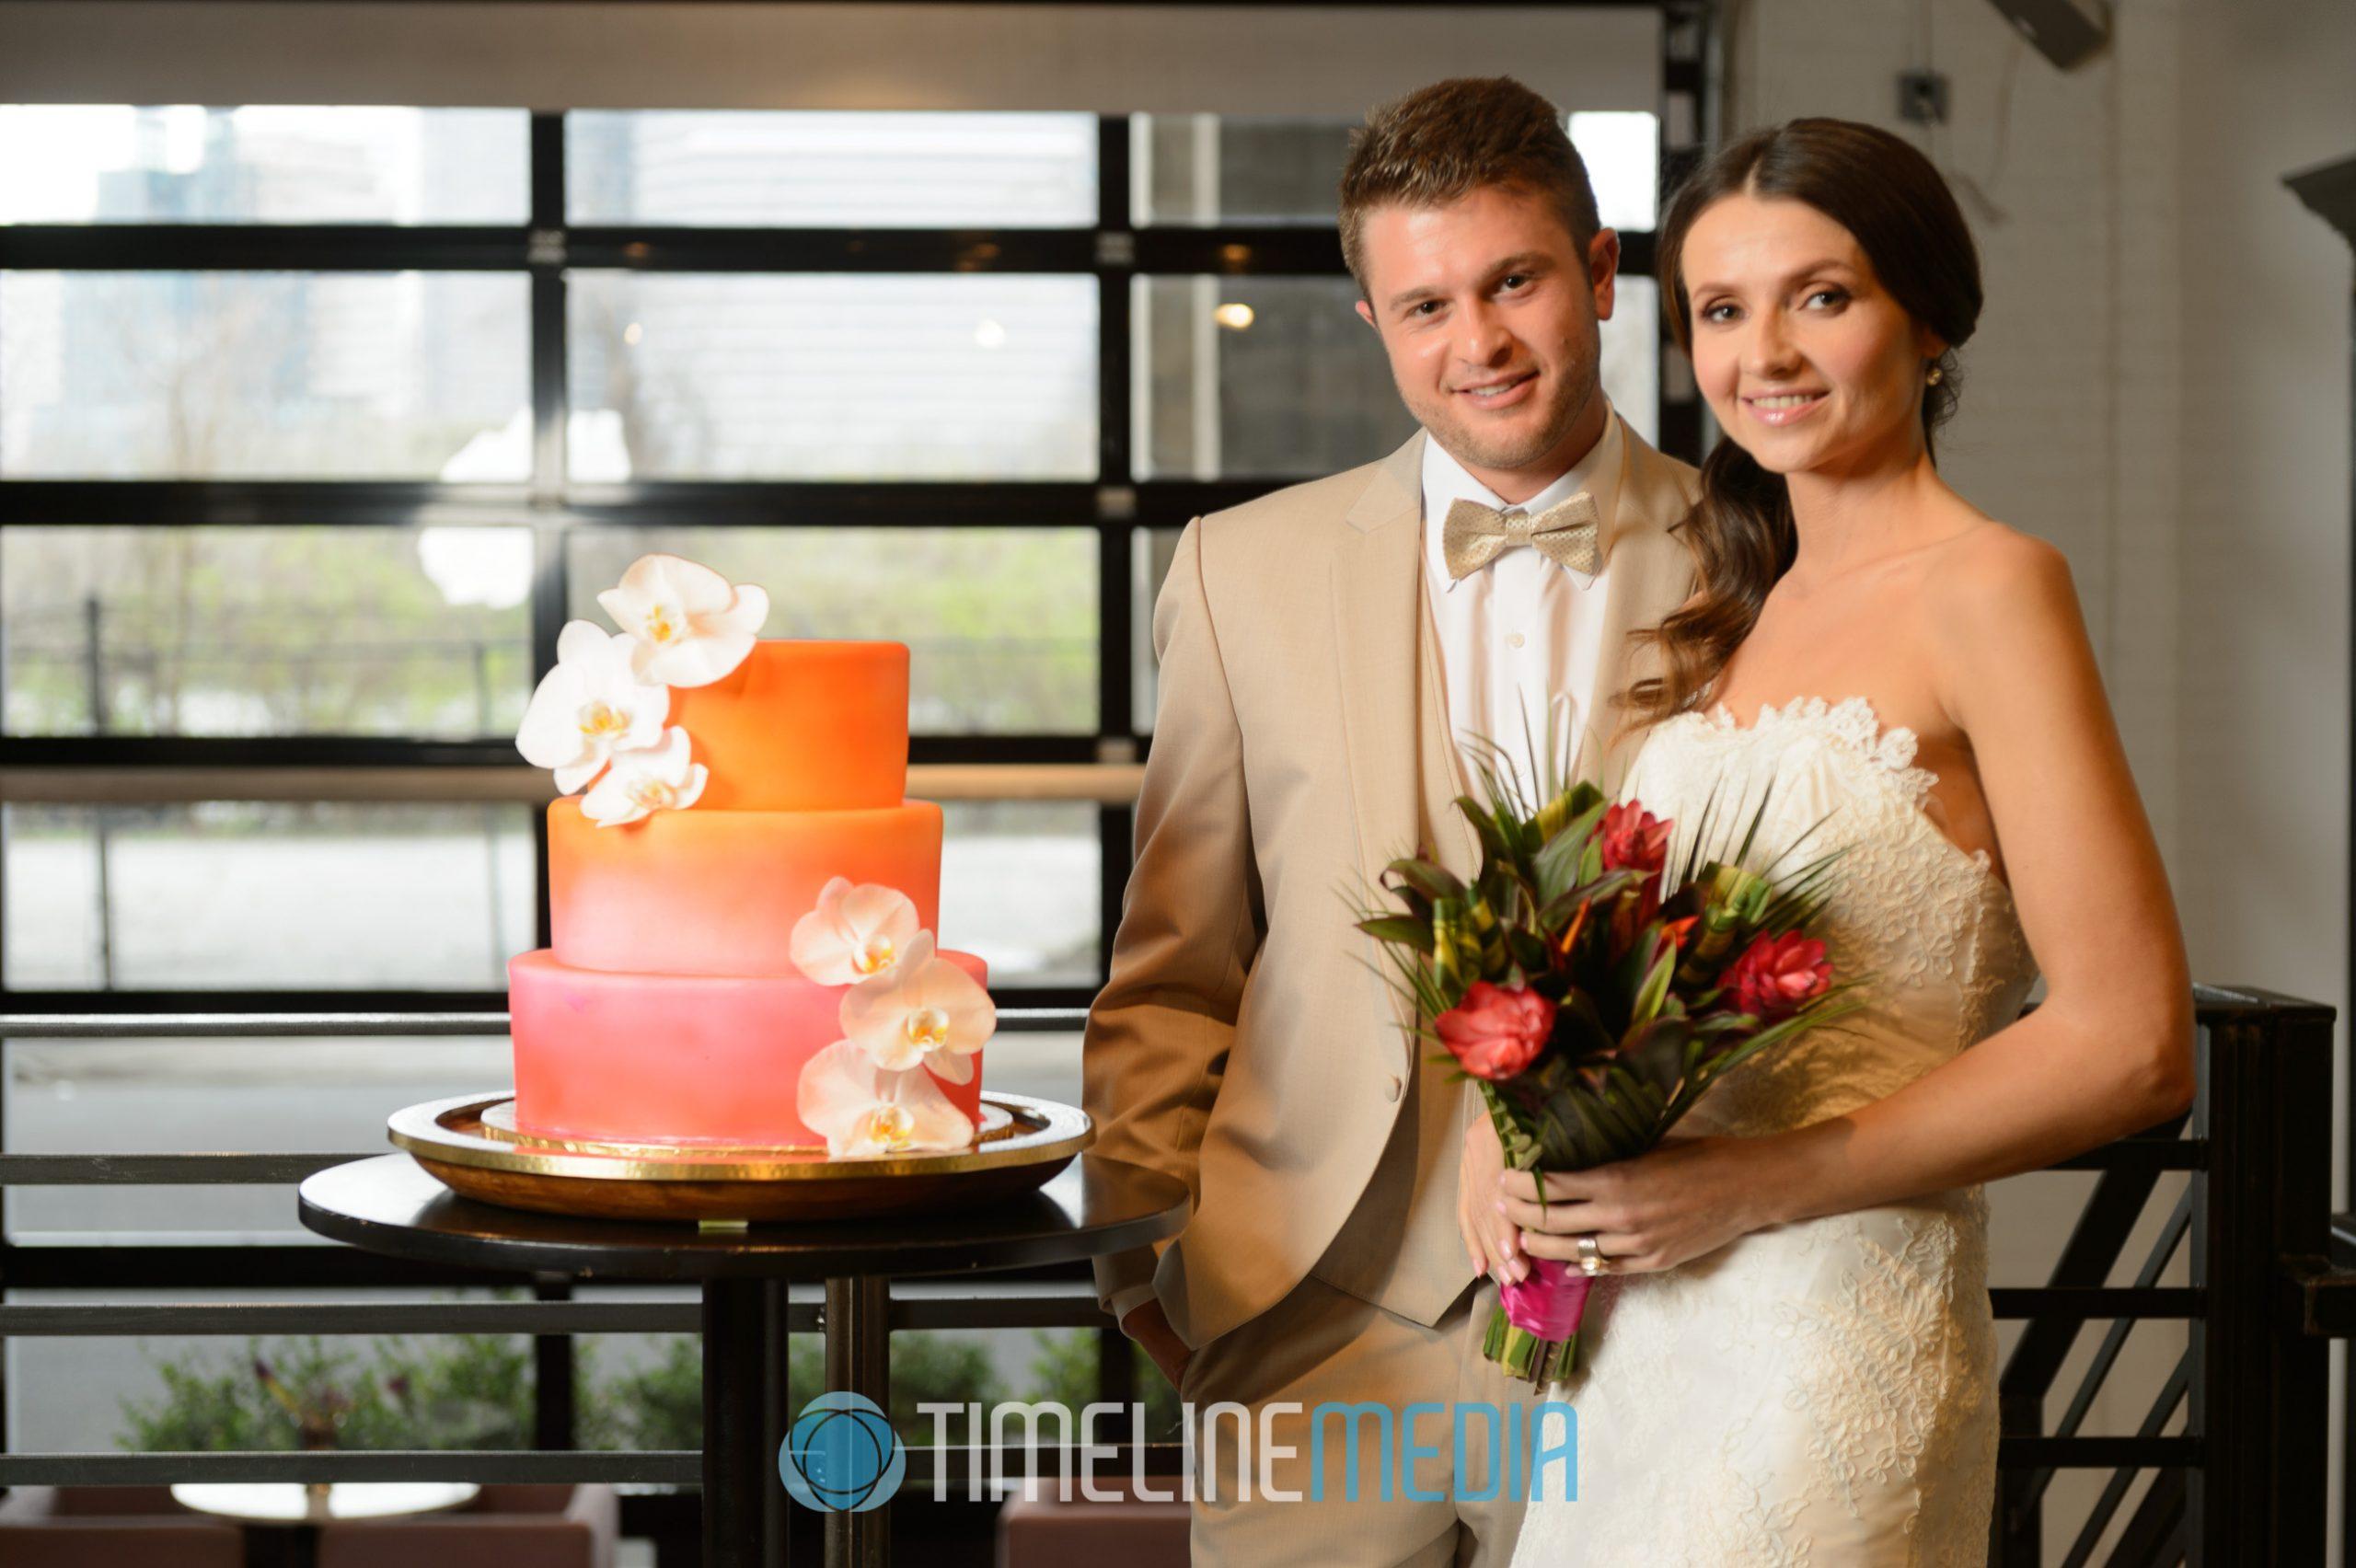 Andrew Roby Events - Bridal Wedding cake reception shoot Malmaison - Washington, DC ©TimeLine Media